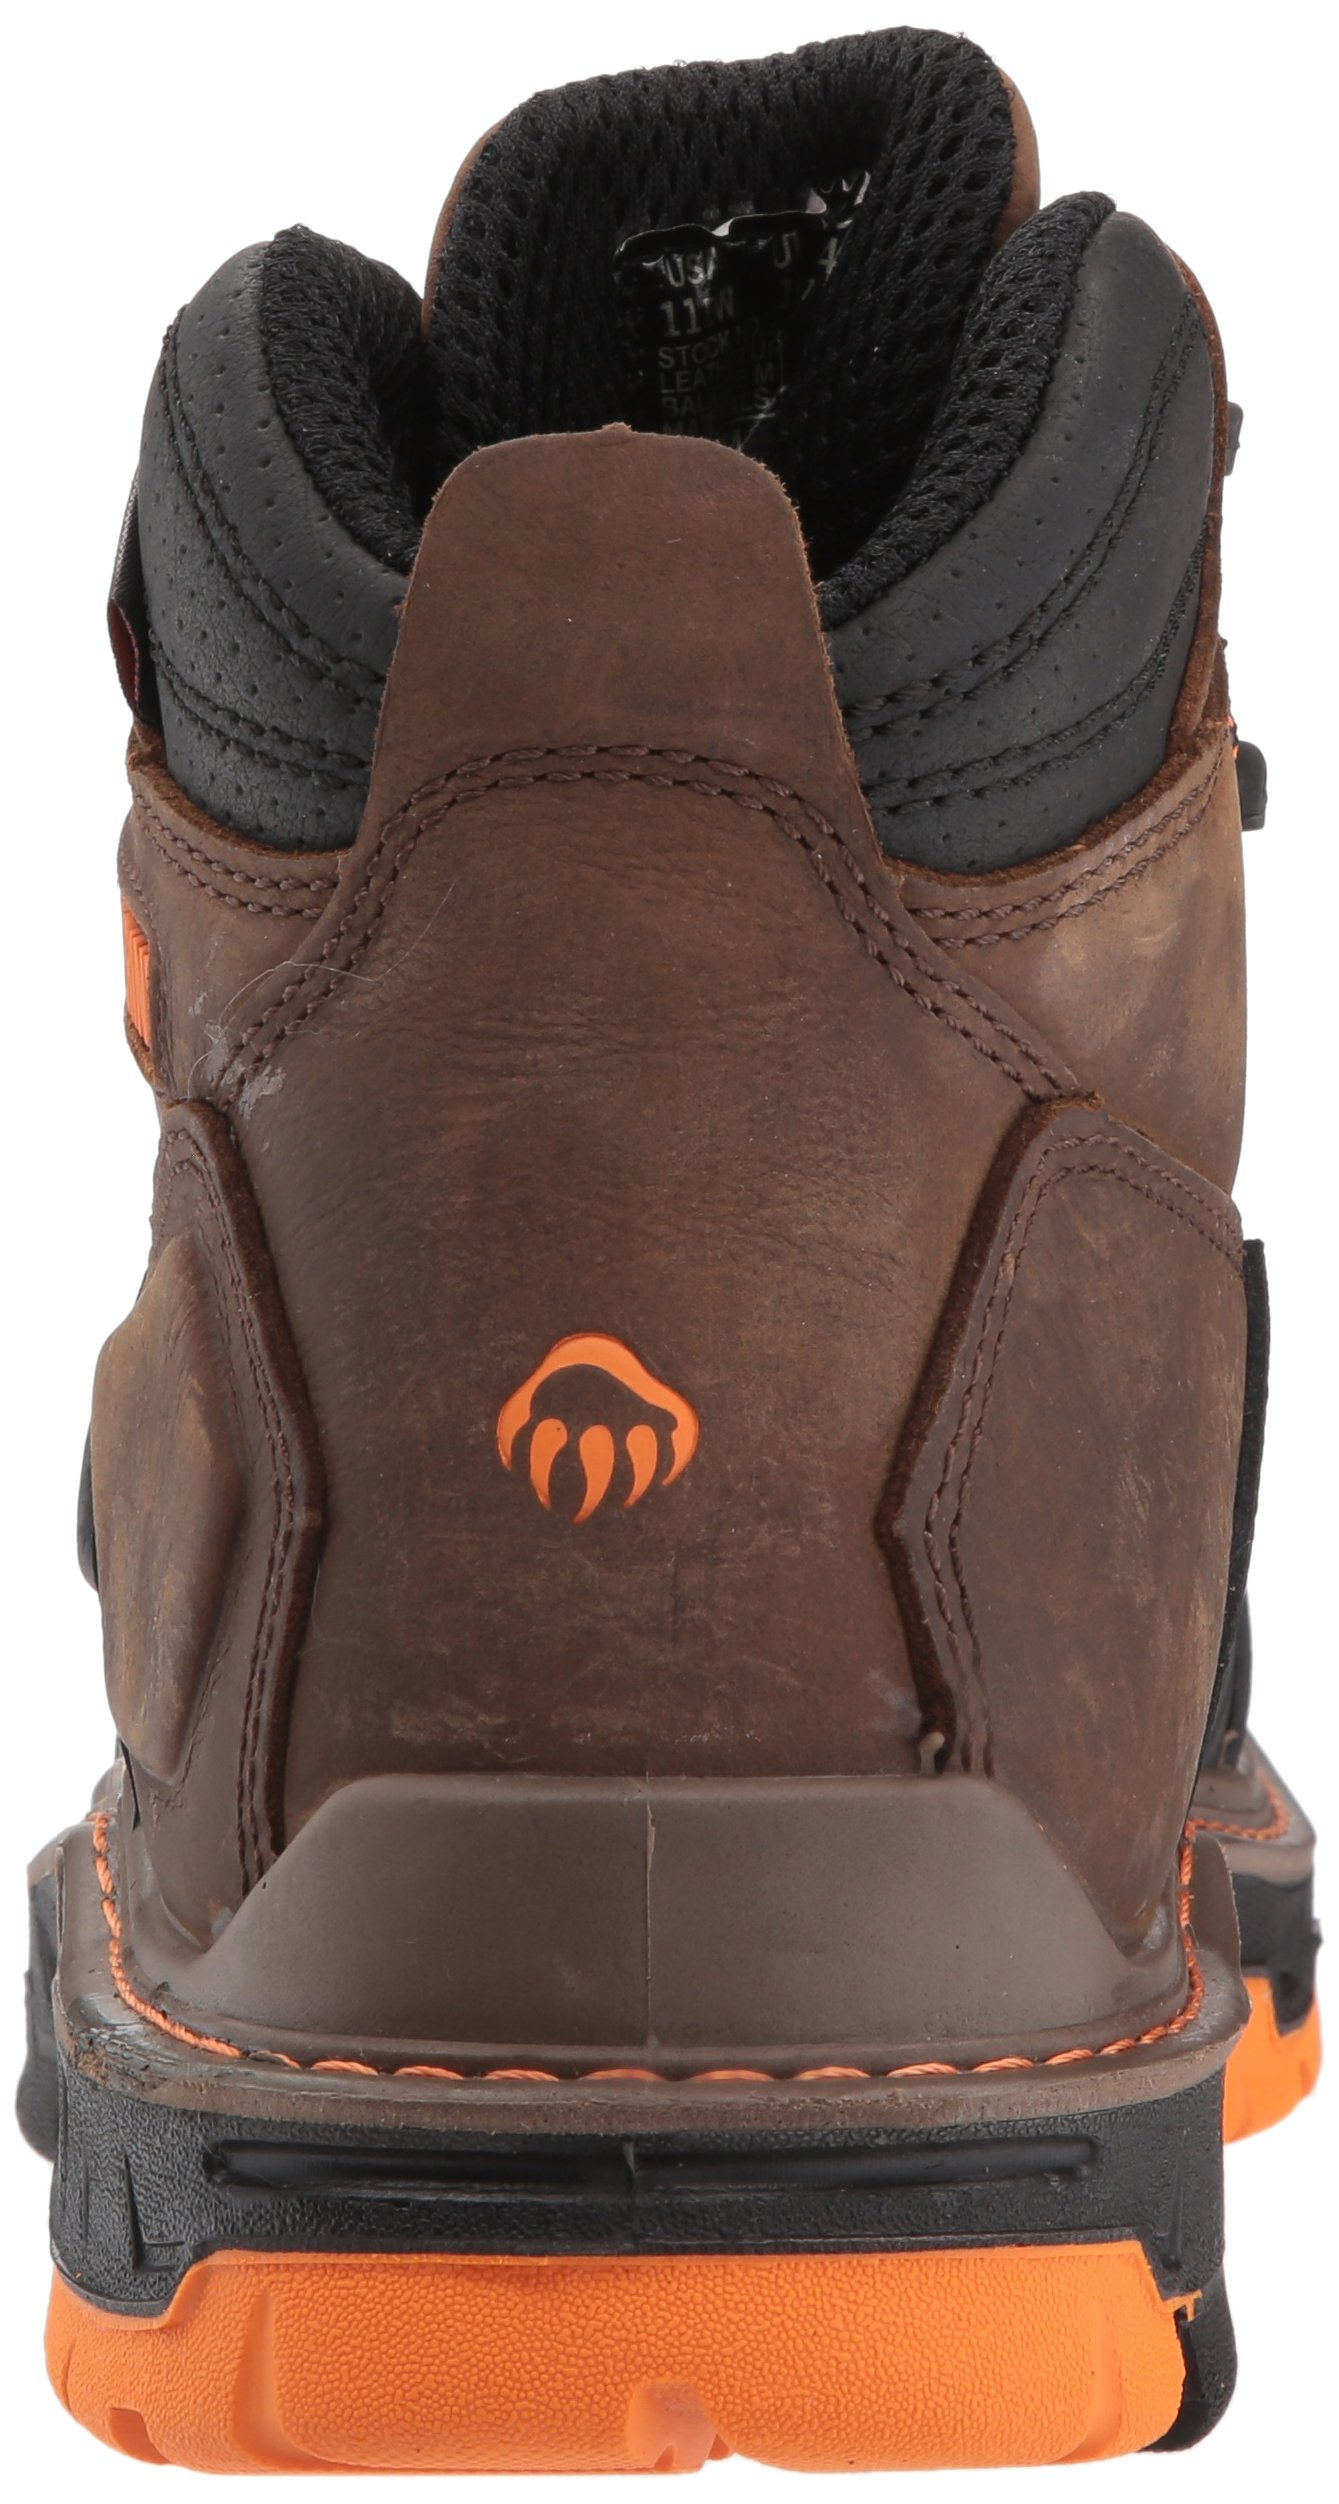 Wolverine Men's Overpass 6'' Composite Toe Waterproof Work Boot, Summer Brown, 10.5 M US by Wolverine (Image #2)